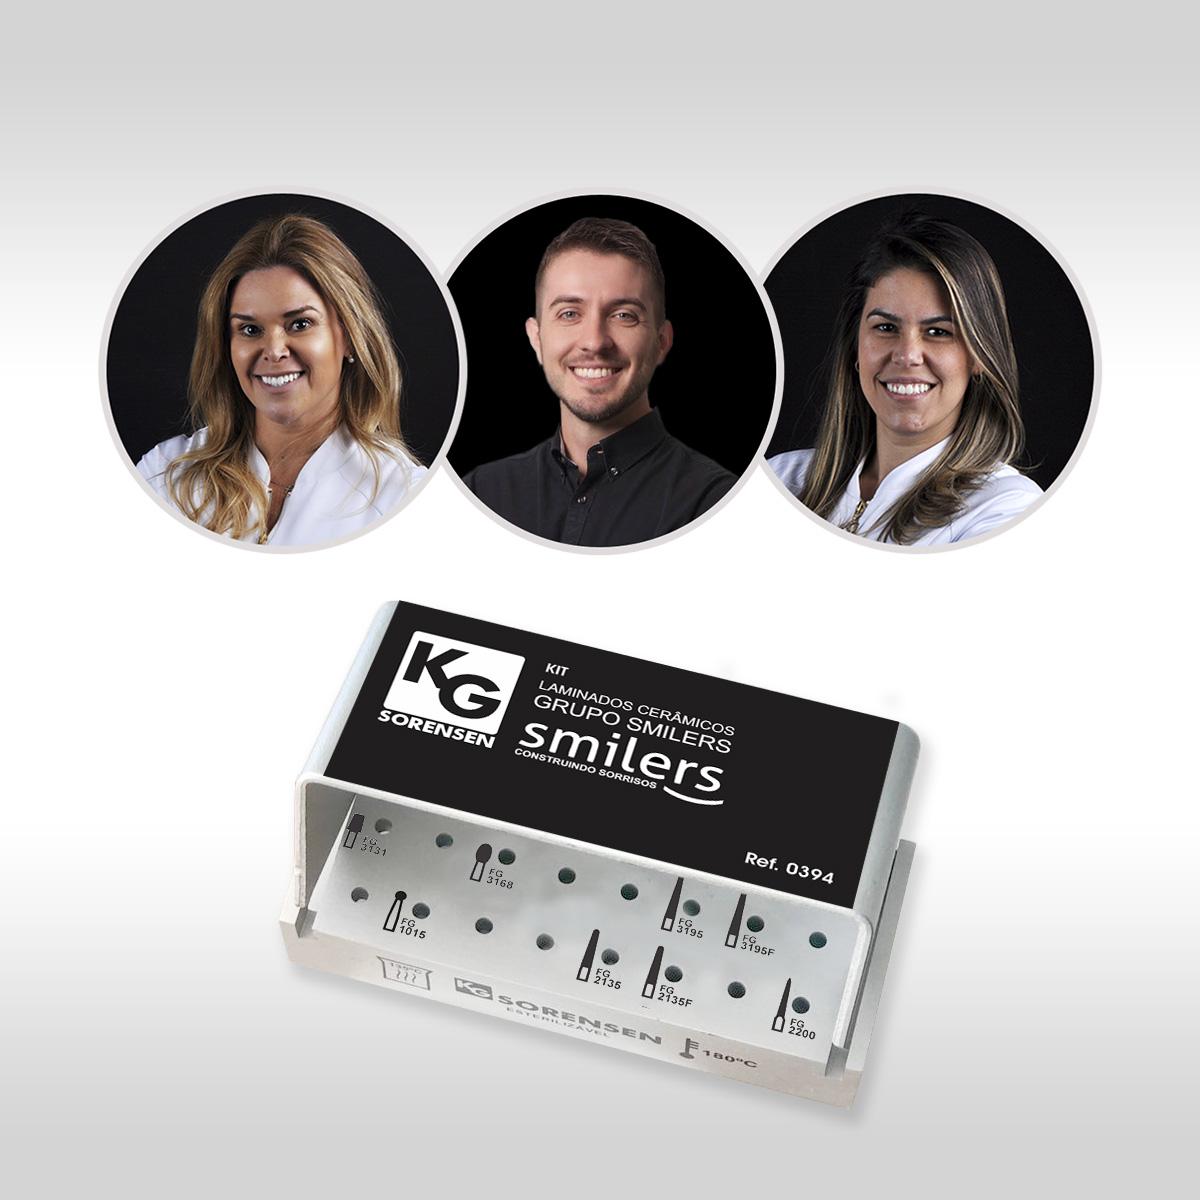 Kit Laminados Cerâmicos GRUPO SMILERS - Ref.: 0394 - KG SORENSEN